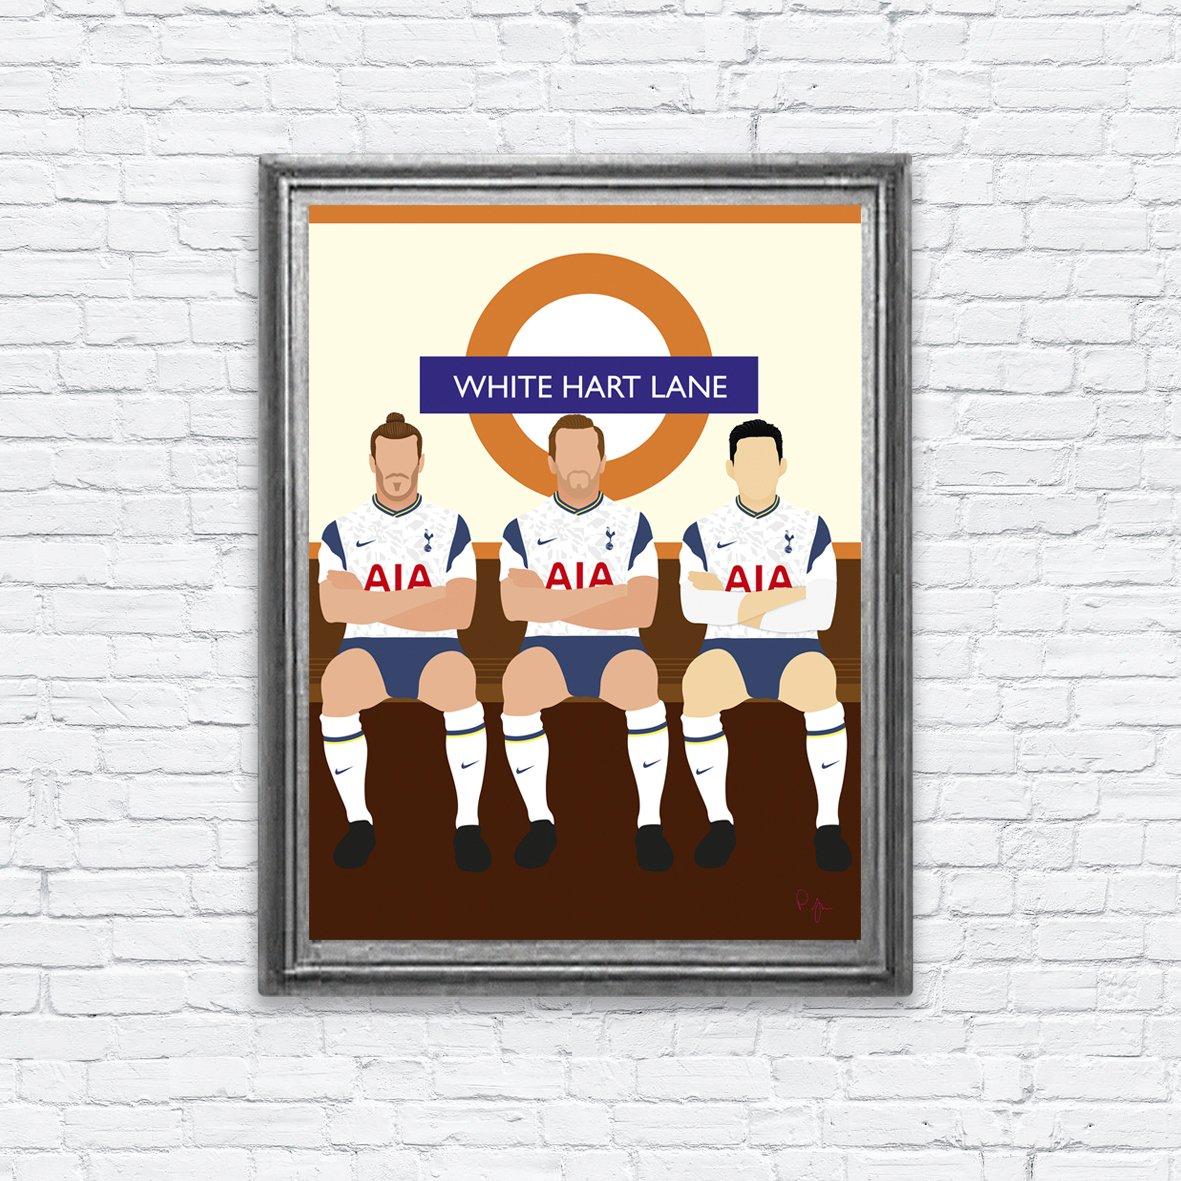 Front 3 ⚽ #Bale ⚽ #Kane ⚽ #Son #art #prints #coys #thfc #london #PremierLeague #football #whitehartlane #spurs #tottenham #tottenhamhotspur #etsyuk https://t.co/v53Zua3KBw https://t.co/riMu1g677l